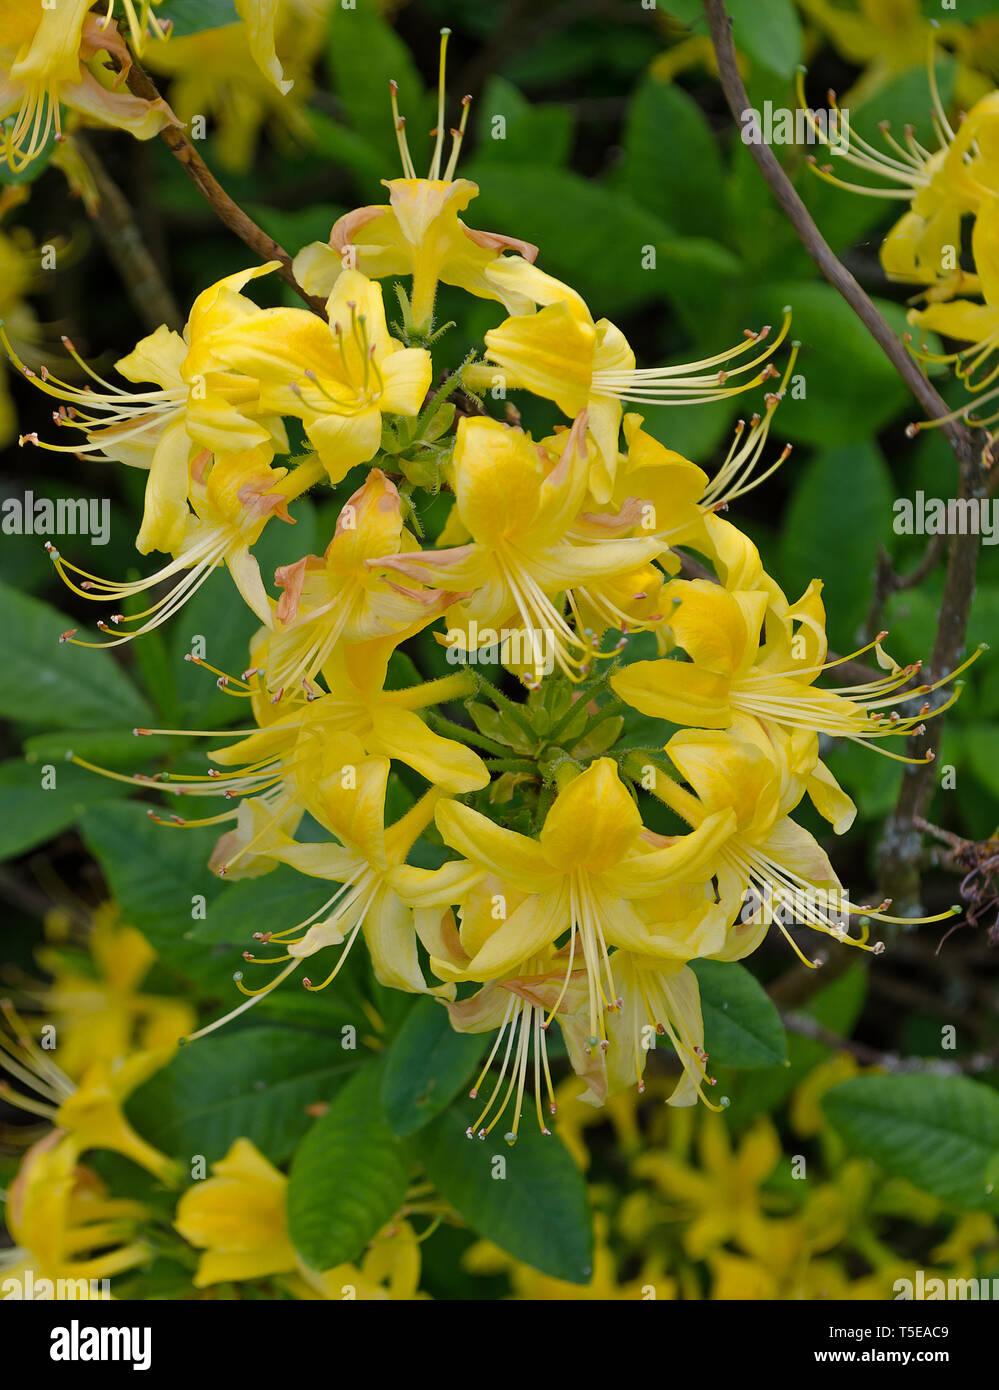 Rhododendron Luteum aka Yellow Azalea or Honeysuckle Azalea Stock Photo